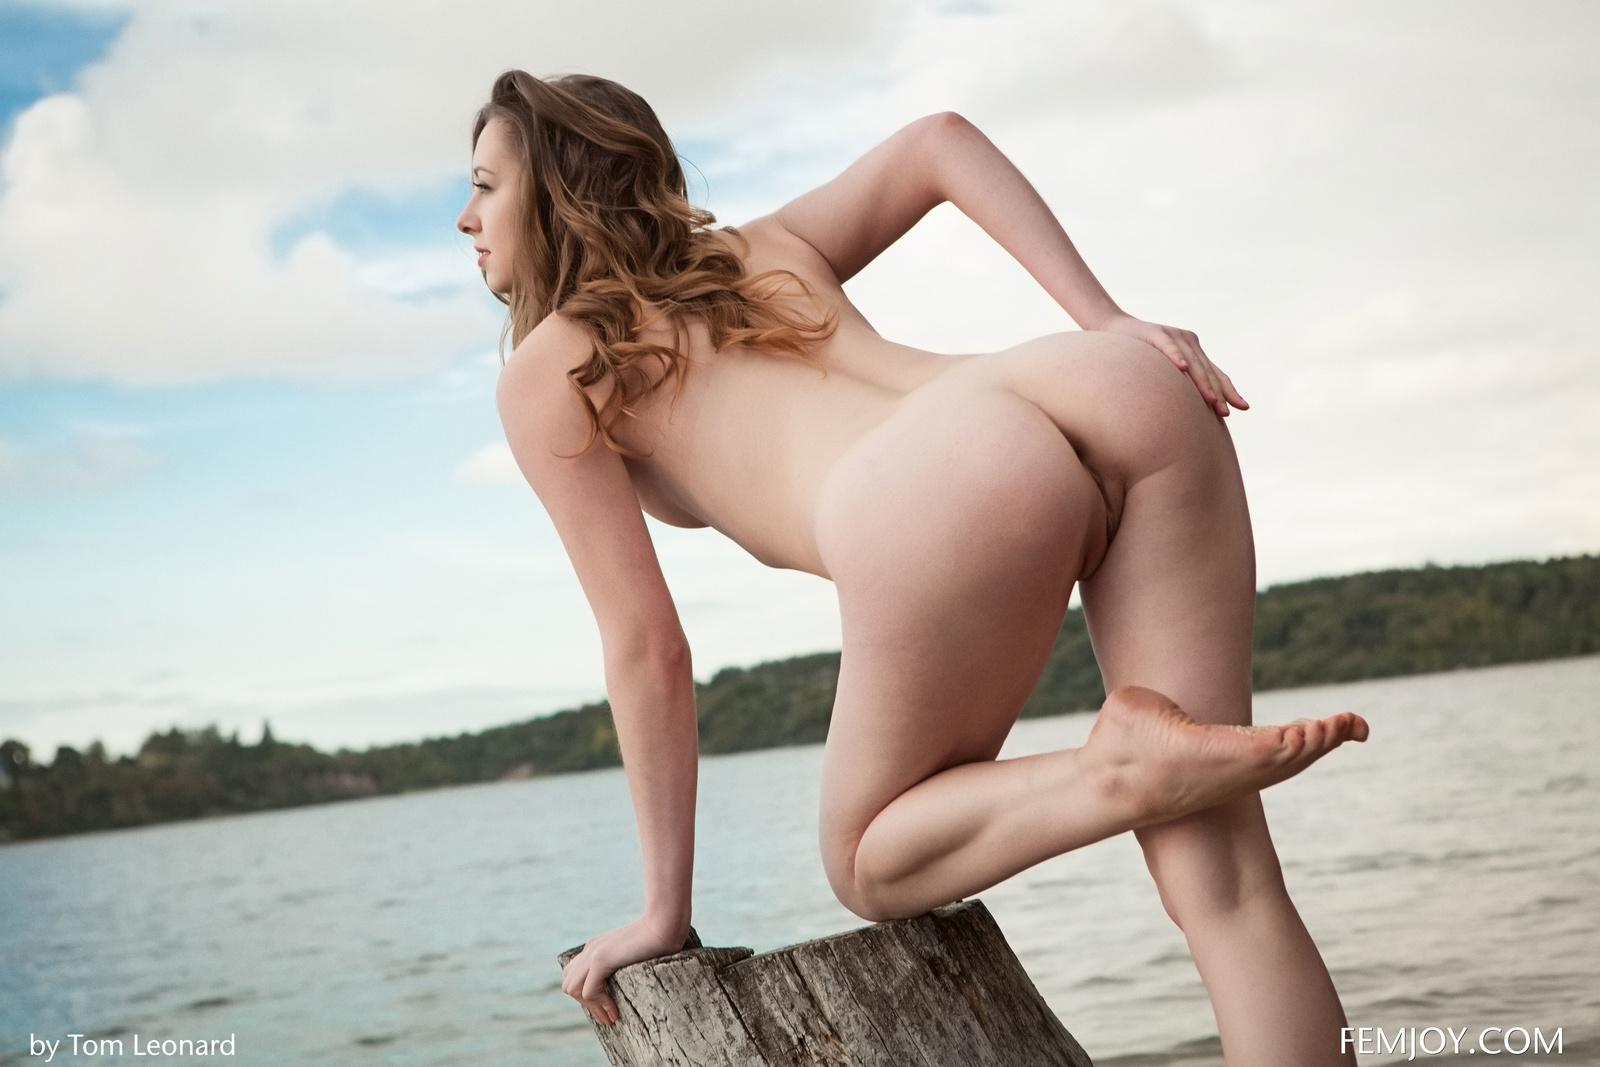 Zdjęcie porno - 02 - Zgrabna i naga laska nad jeziorkiem